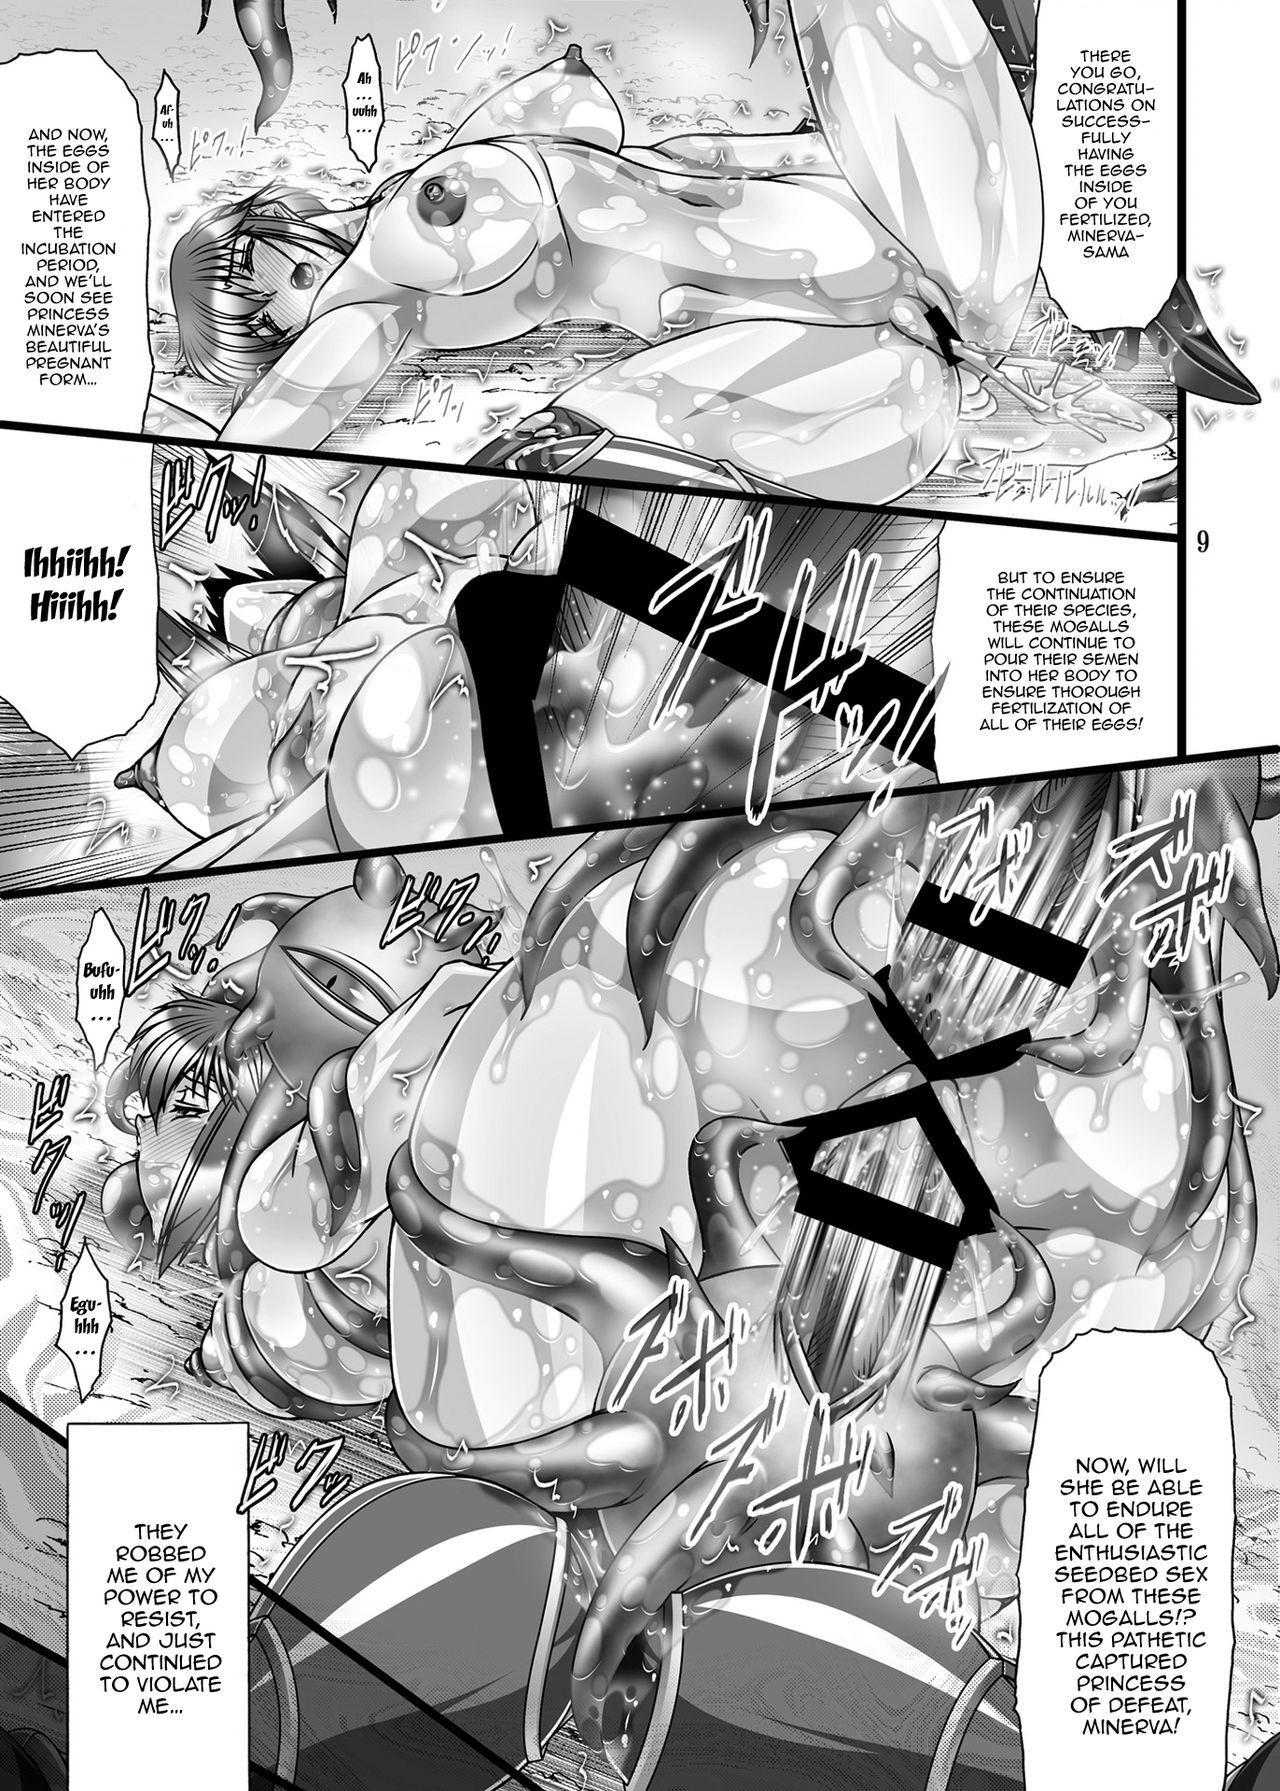 Oshi Chara Emblem | Favorite Emblem Characters 7